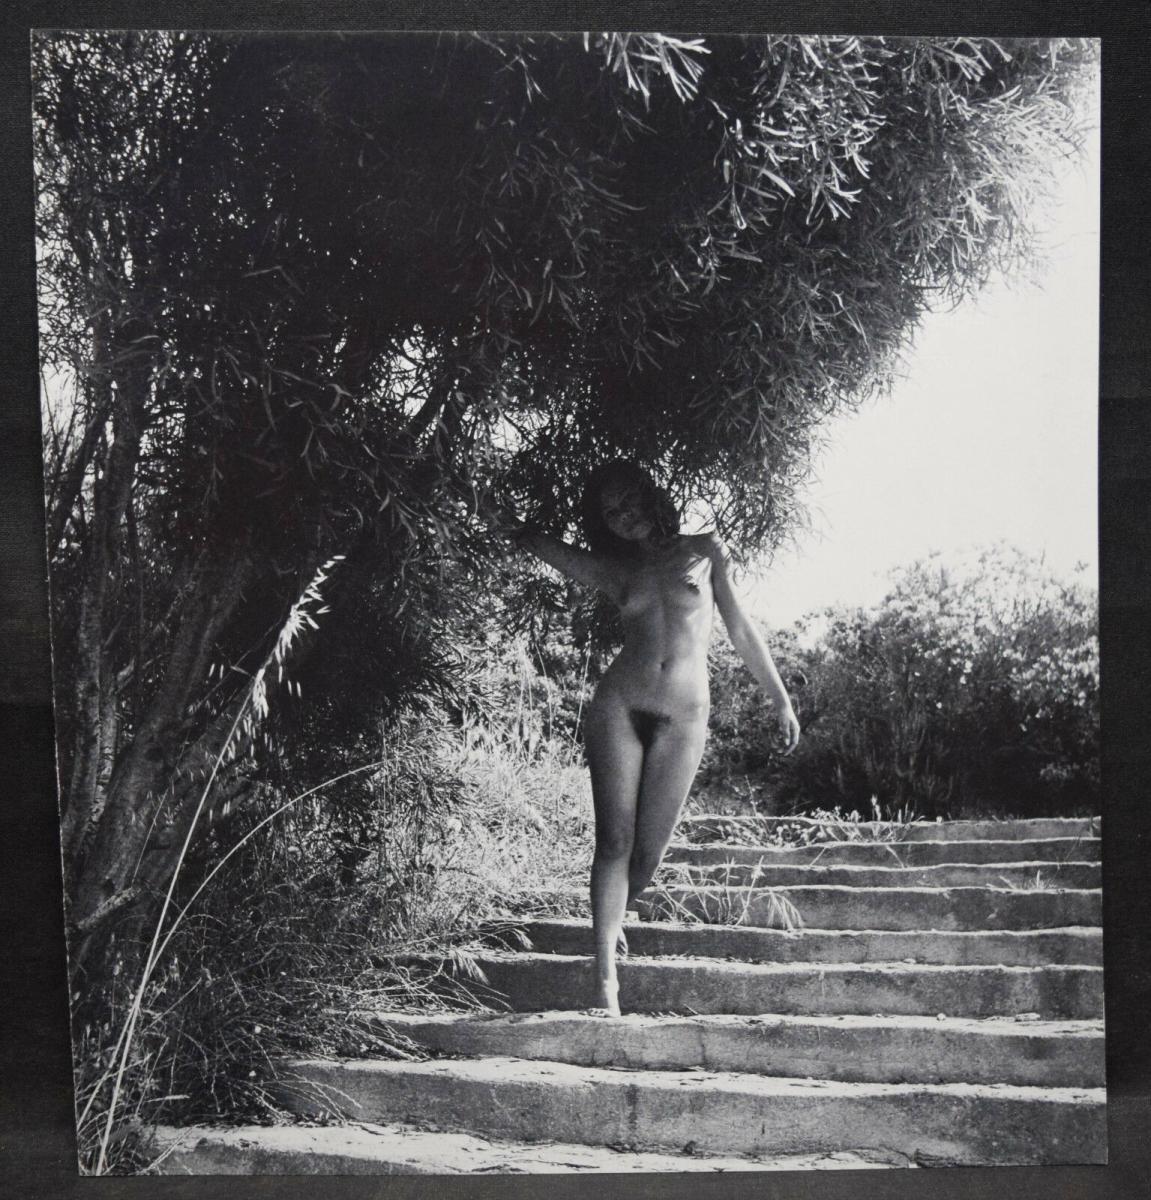 ANDRÉ KRETZ - CANTATE A NAUSICAA - WIDMUNG - ORIGINALZEICHNUNG - 1980 - FOTOS 5